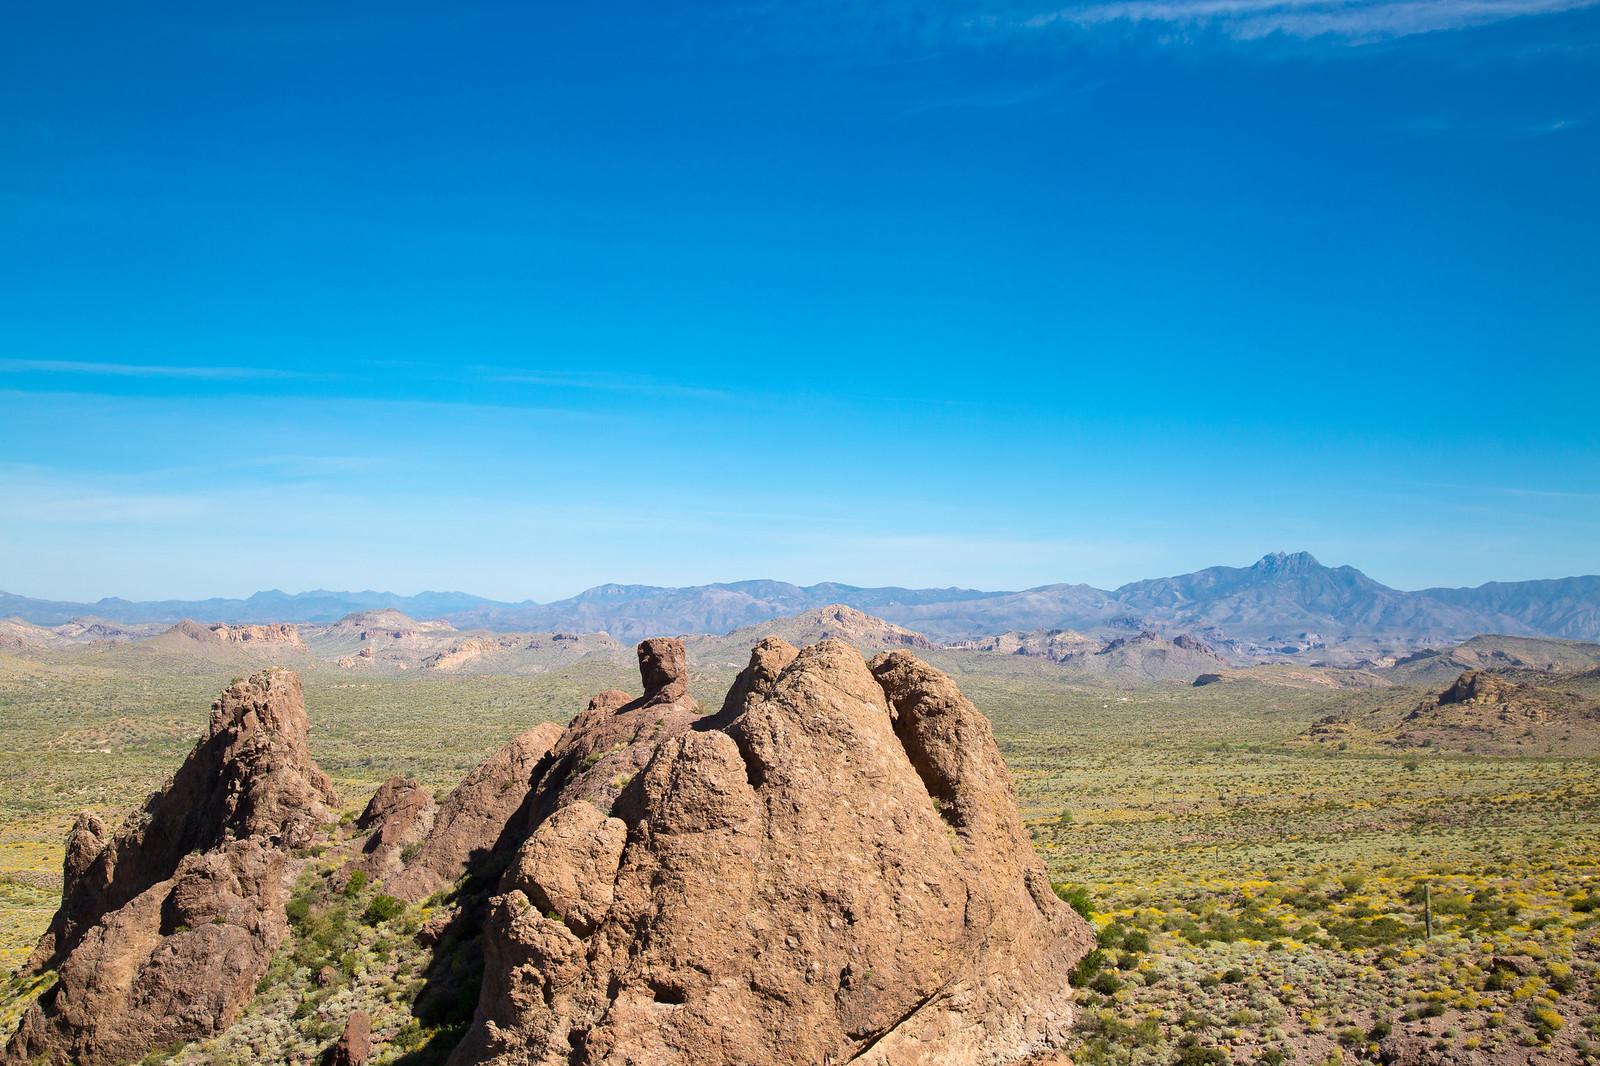 2015-03-12 Arizona-6431.jpg